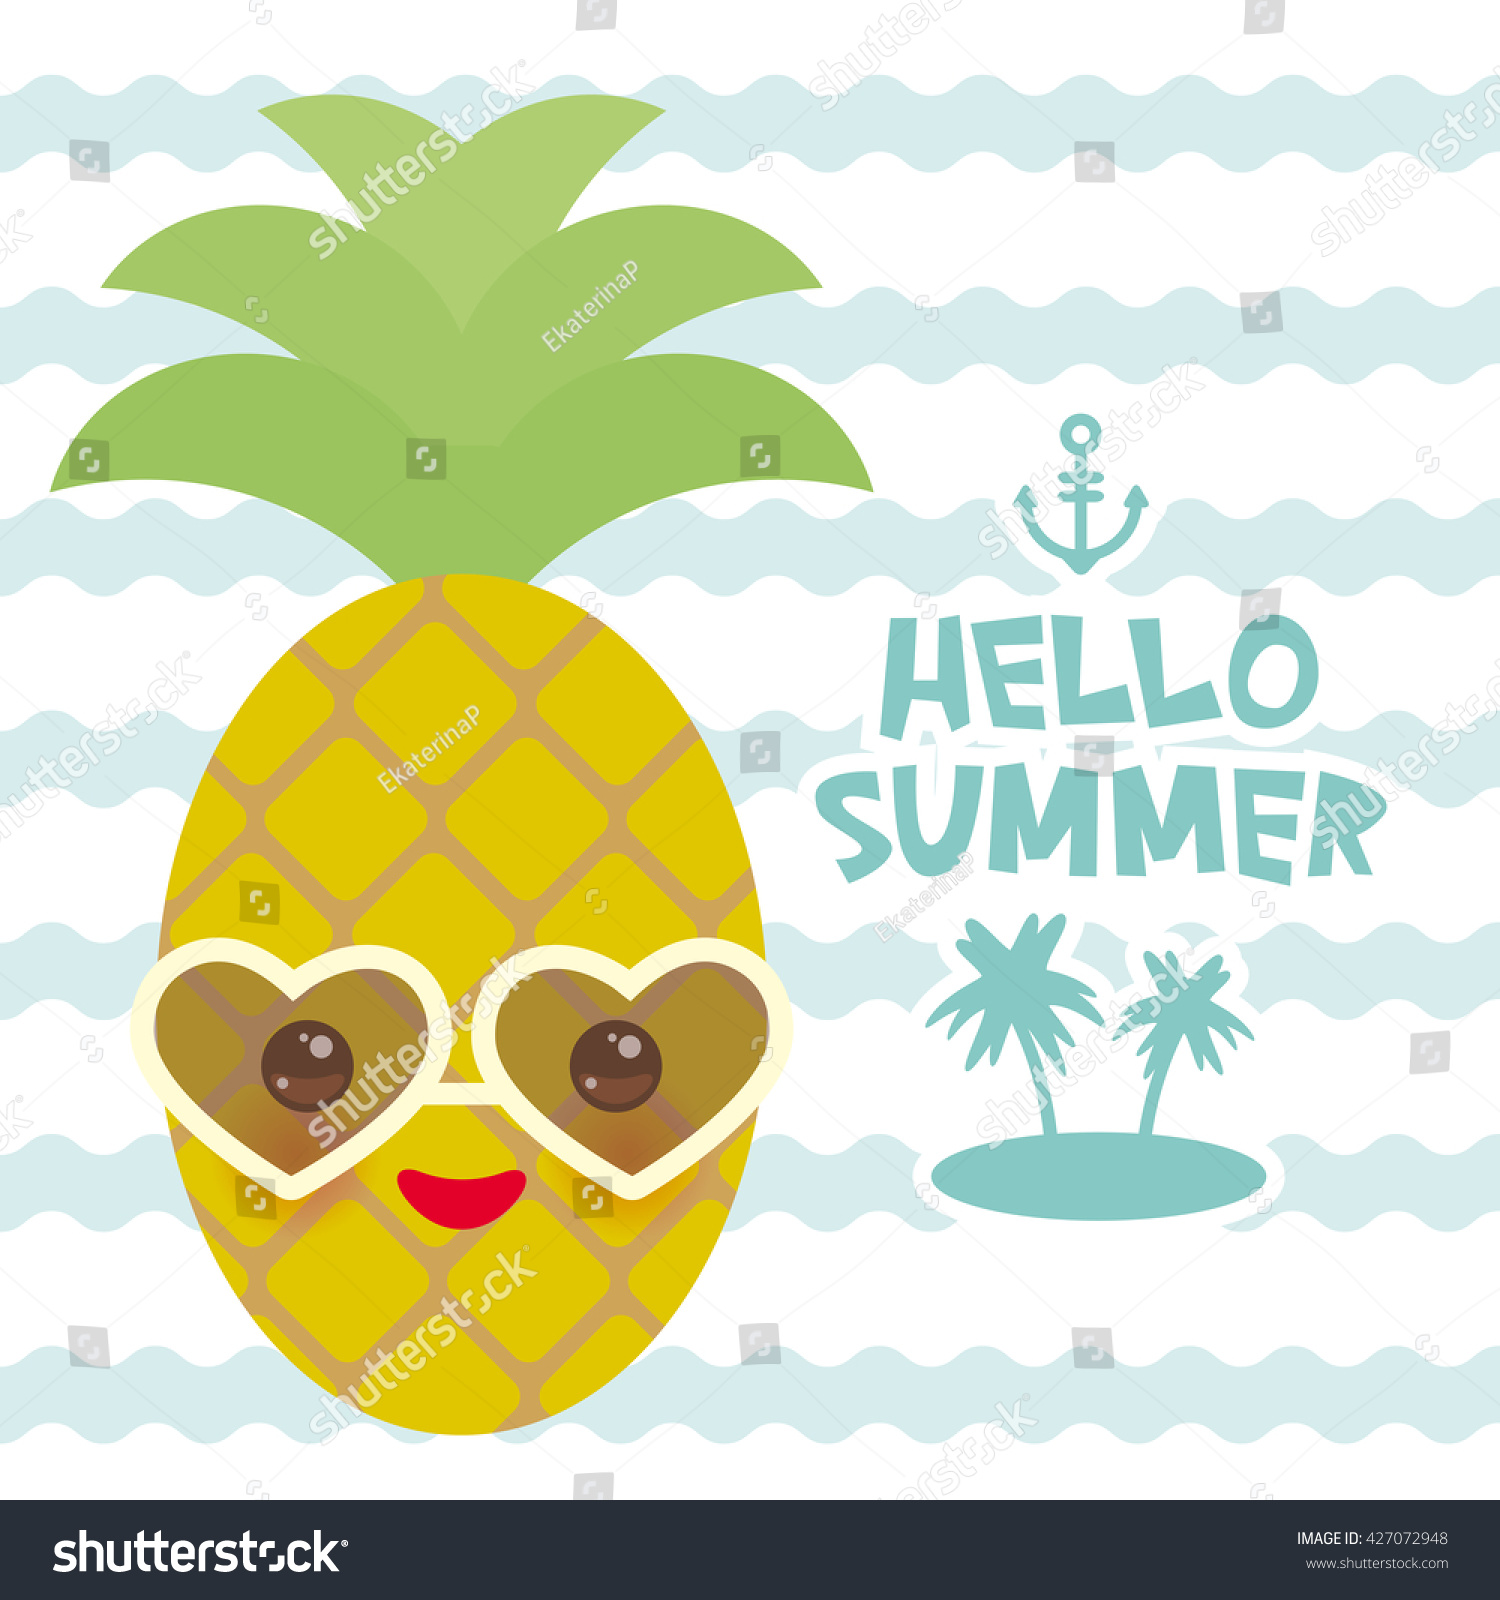 Hello Summer Cute Funny Kawaii Exotic Stock Vector 427072948 - Shutterstock